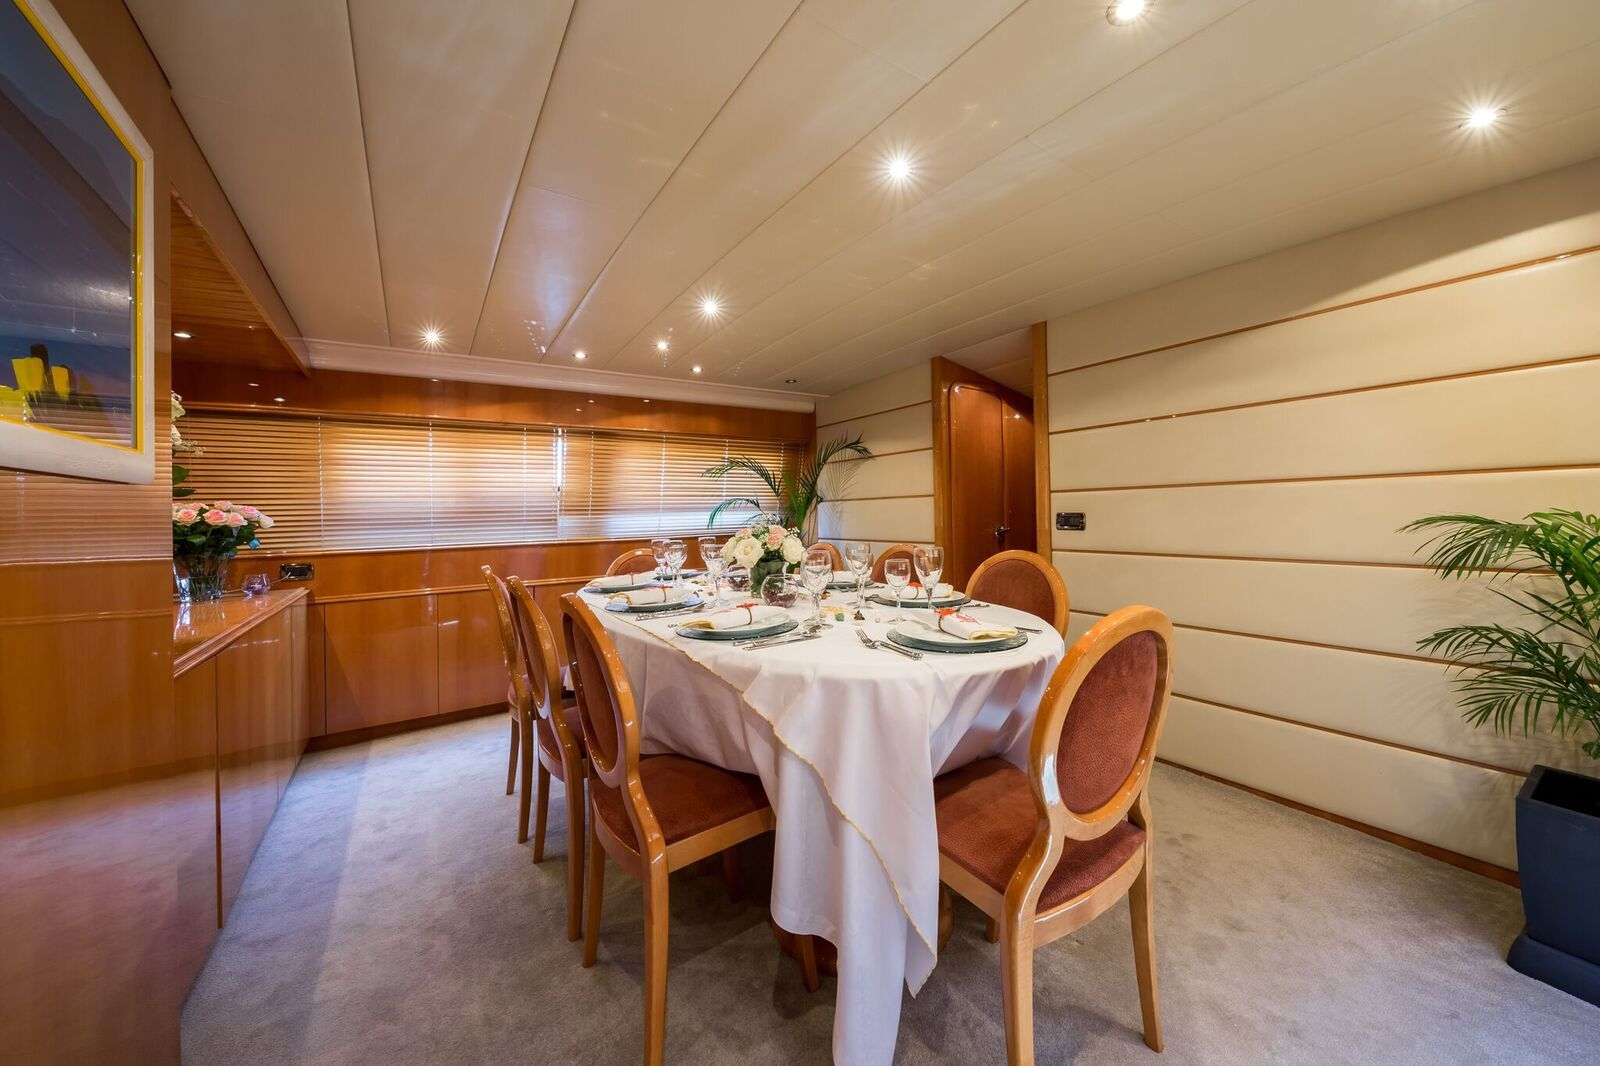 INDULGENCE OF POOLE Mangusta 86 Luxury Superyacht Dining Room